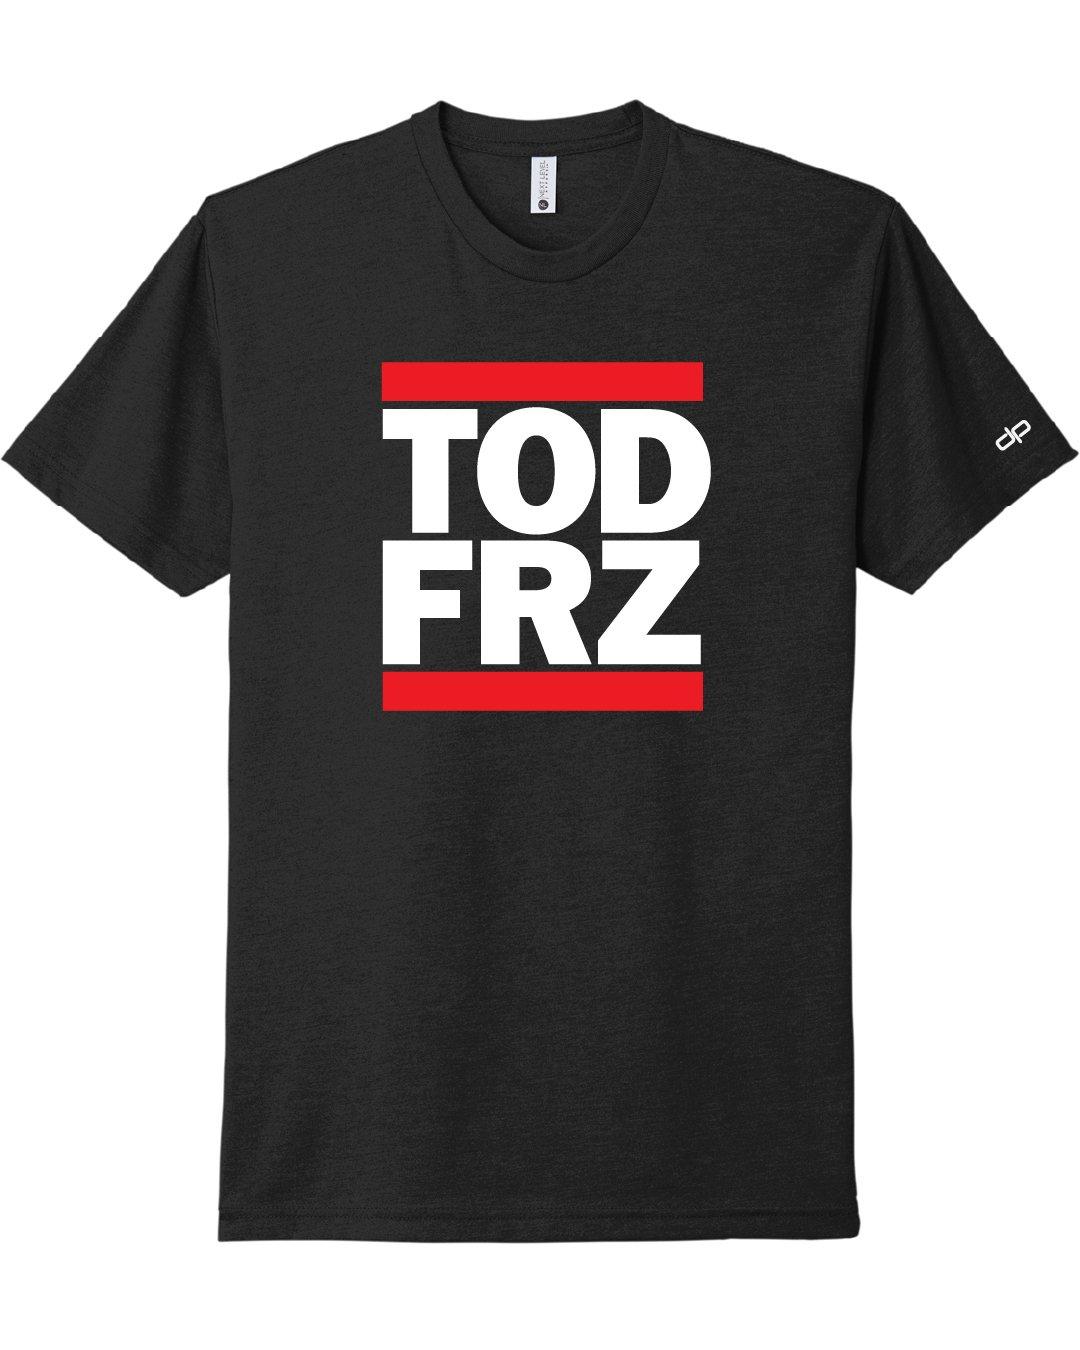 tshirt.todfrz